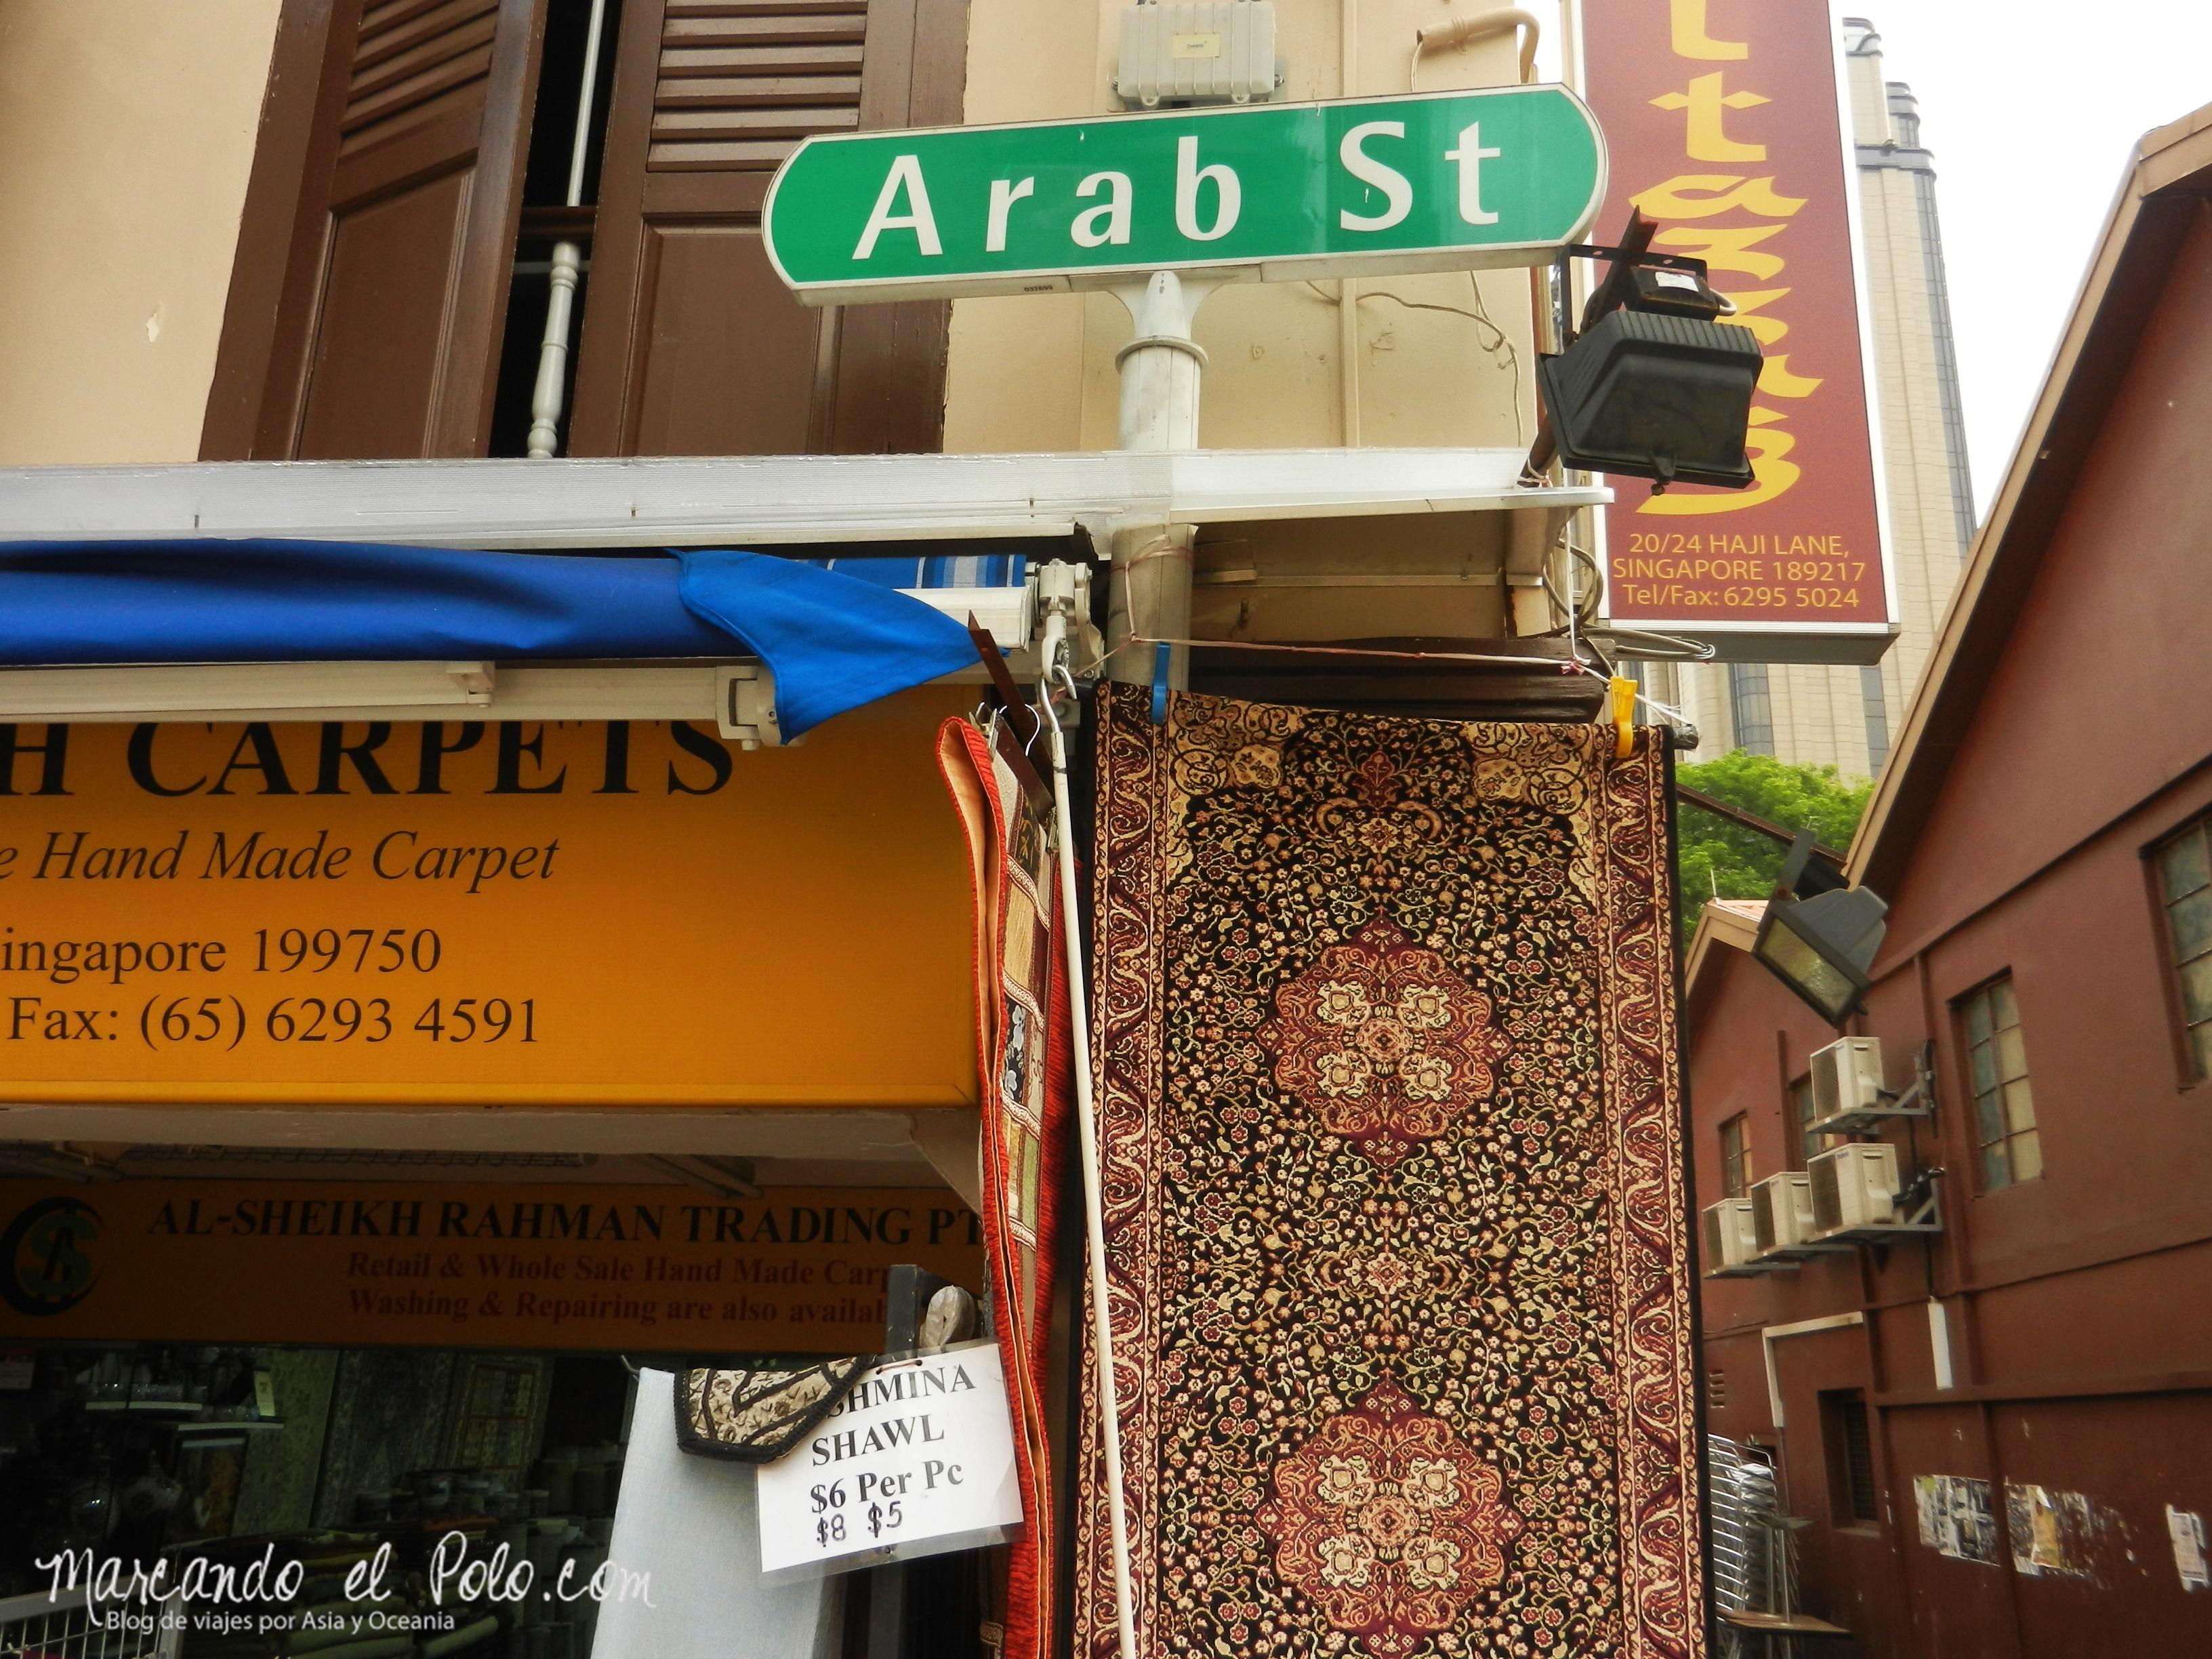 Arab St, Singapur, Asia